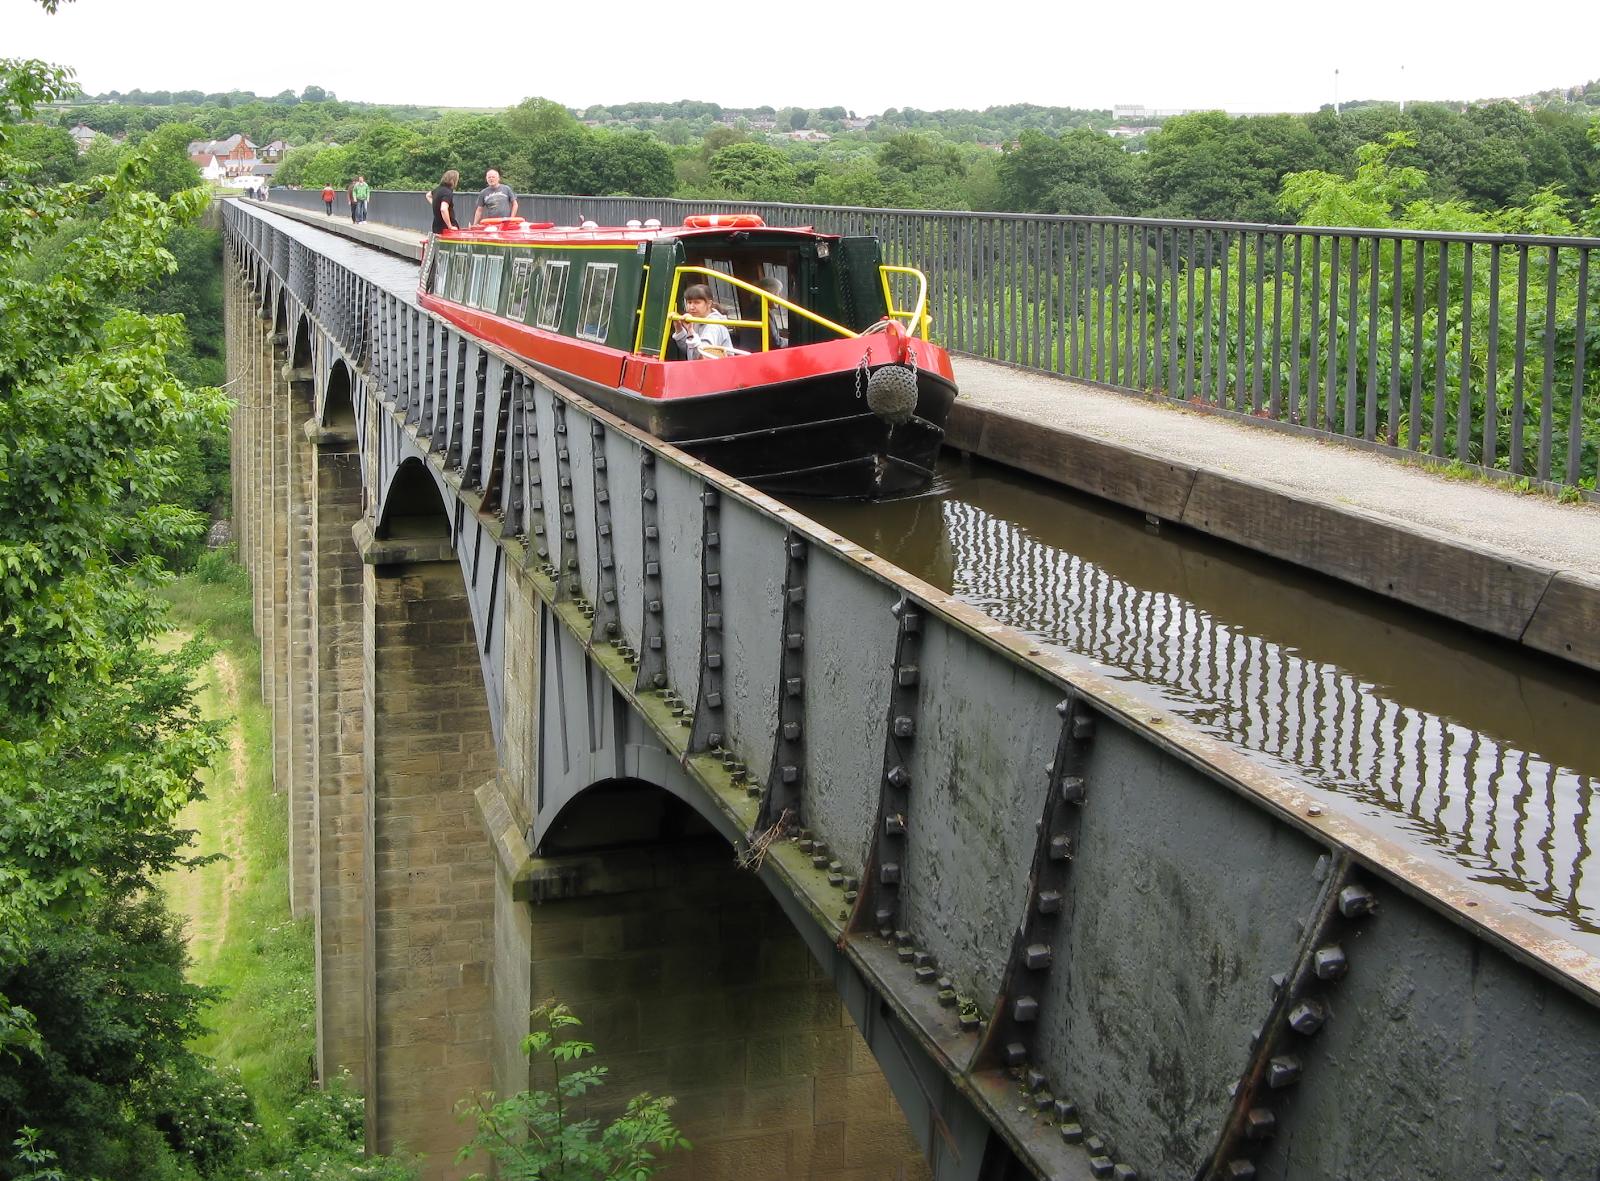 GJW Blog - Narrowboat Route Llangollen Canal